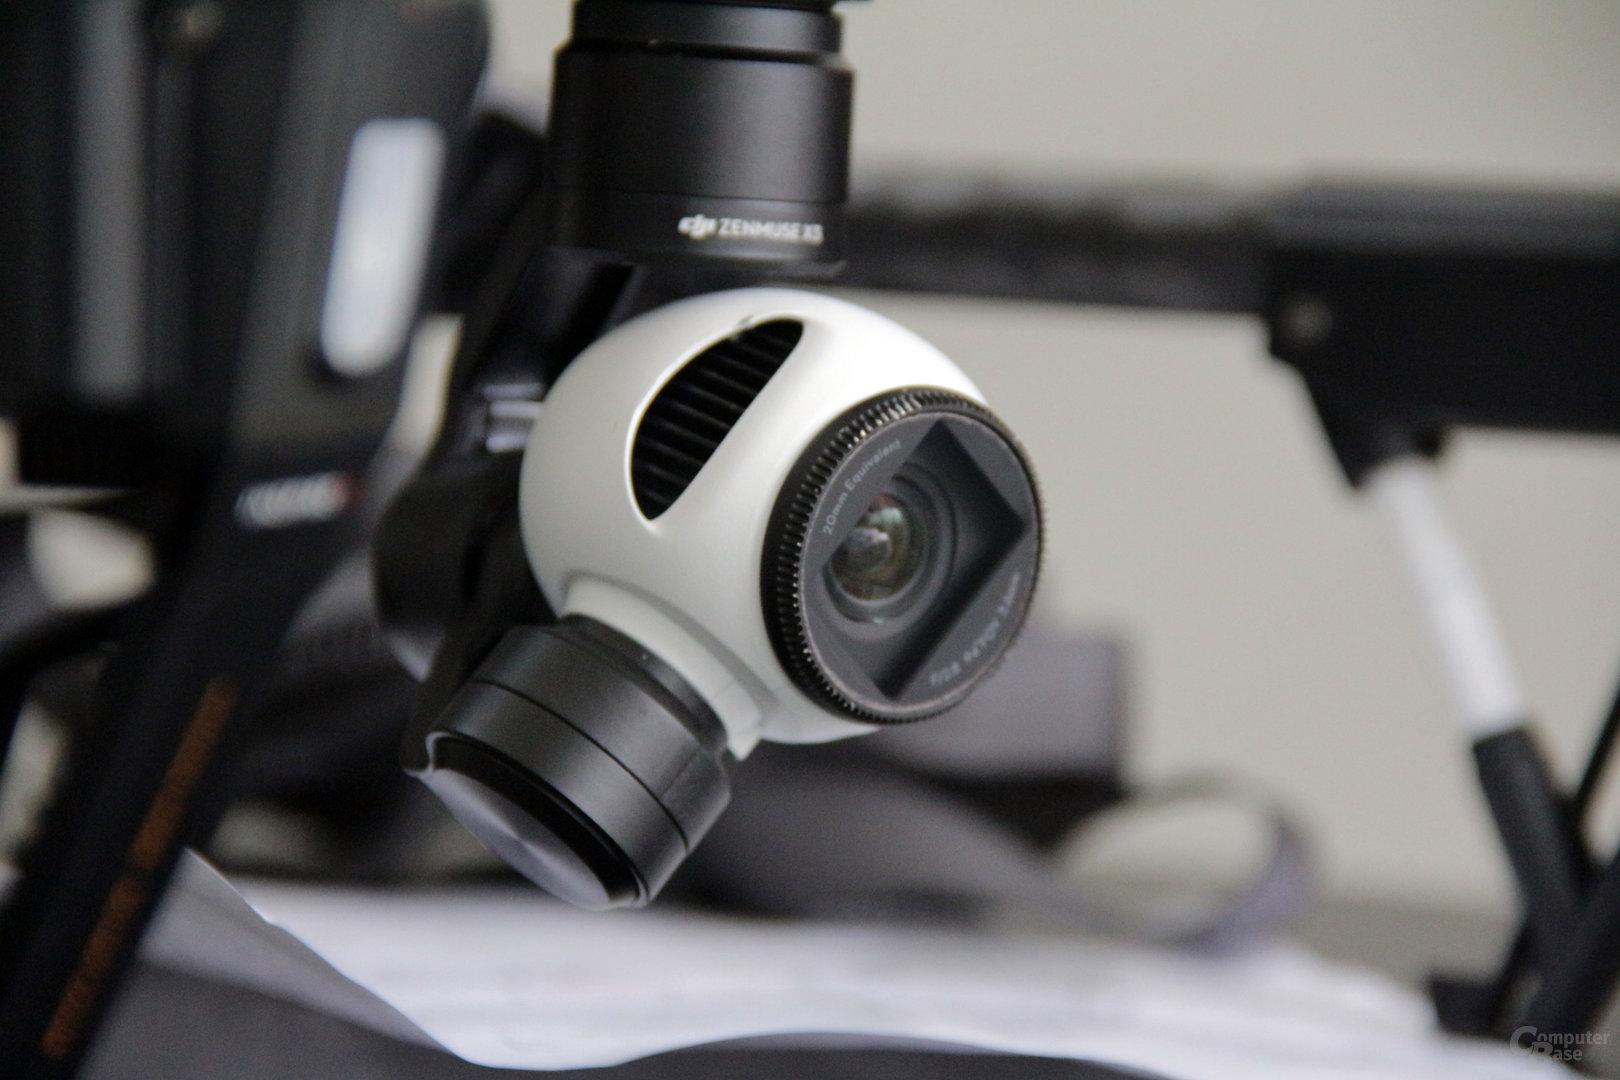 Der Zenmuse X3 Gimbal mit 12,4 MP-Kamera